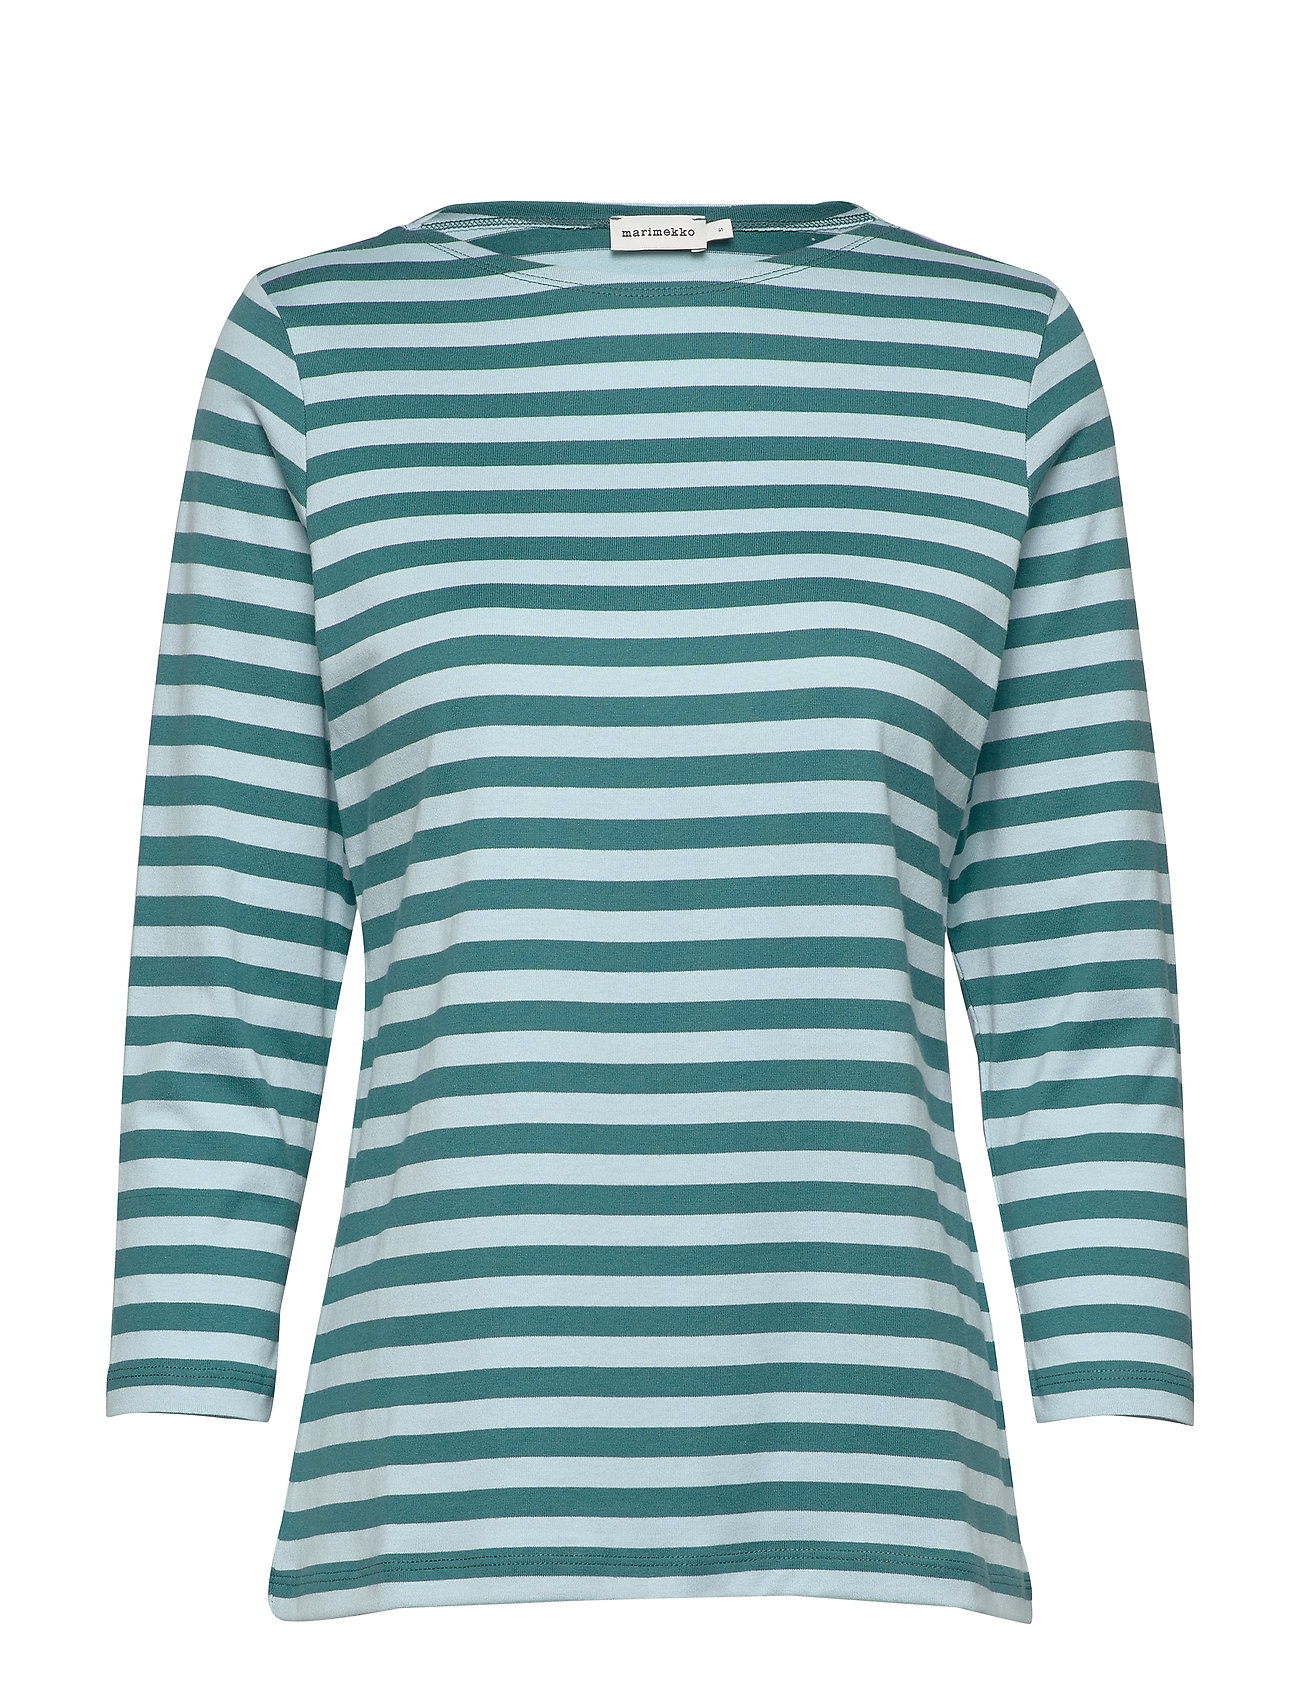 Marimekko ILMA Shirt - PETROL, TURQUOISE